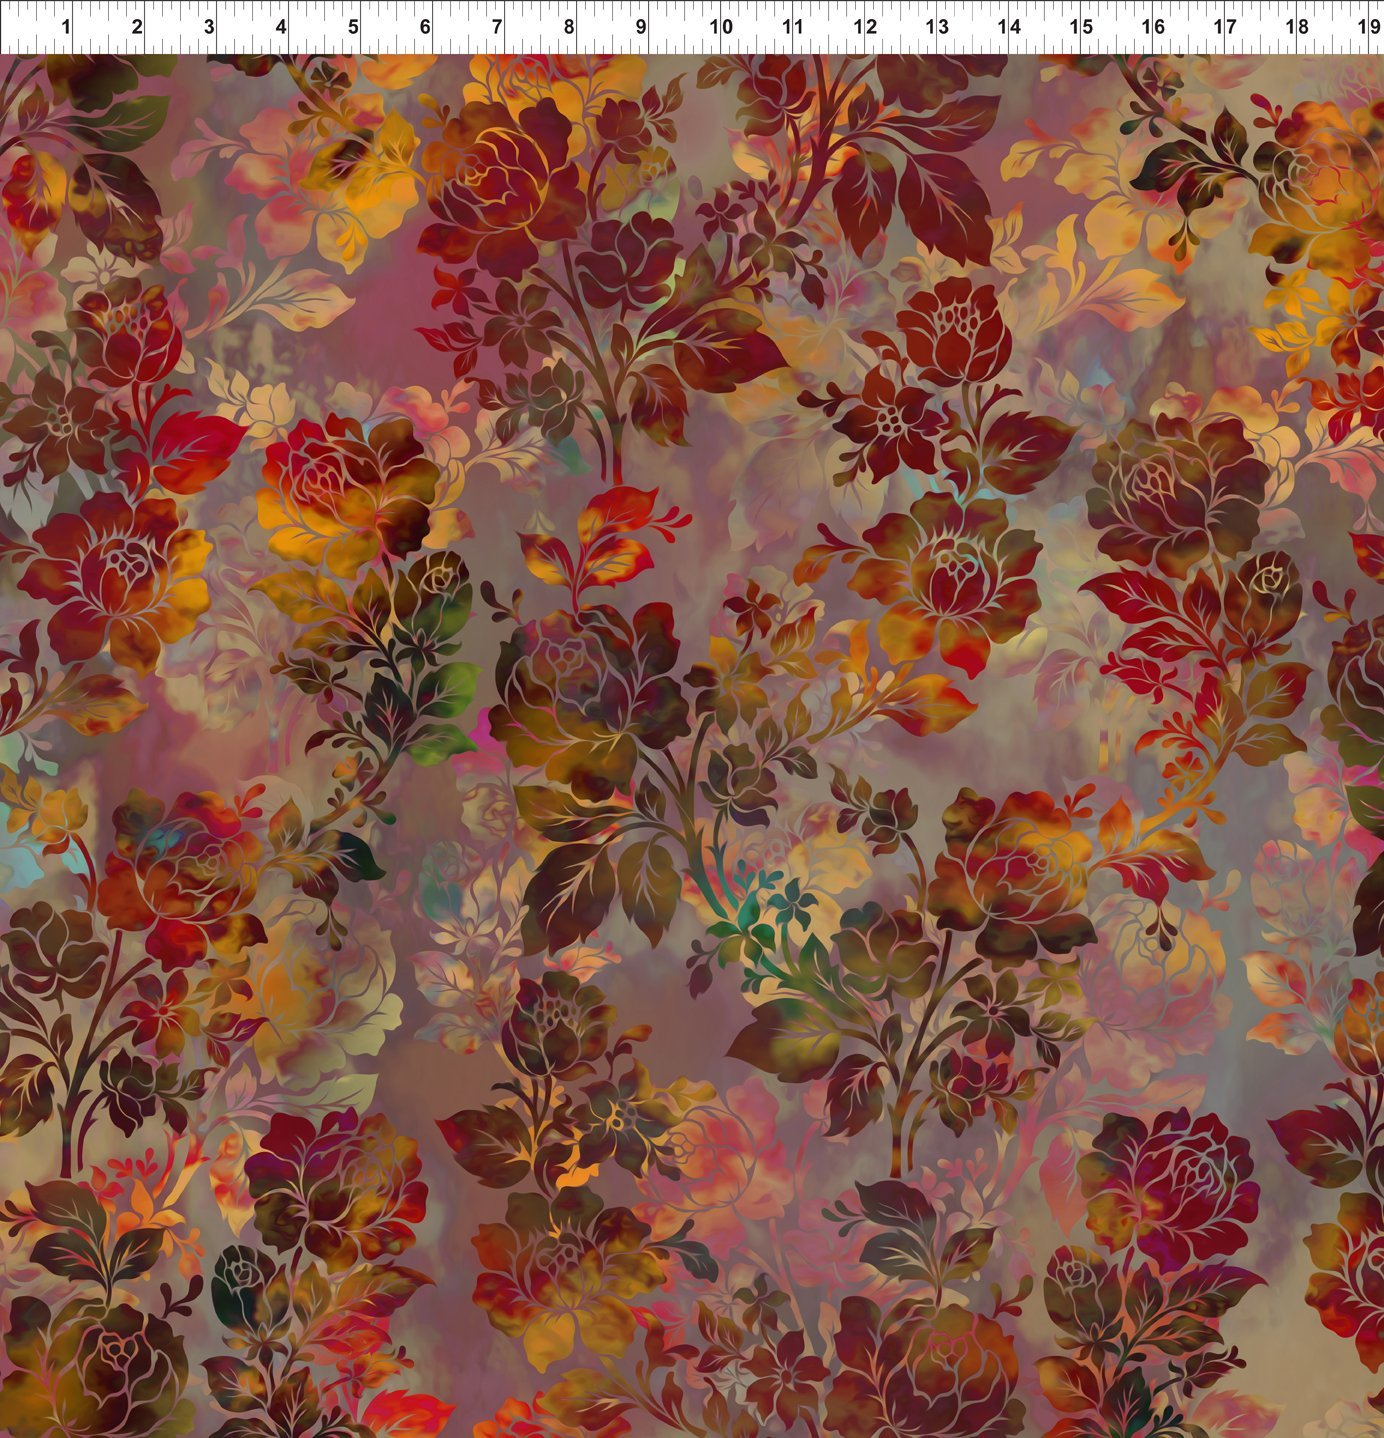 1ENC-2 Mulberry Night Bloom Diaphanous Jason Yenter